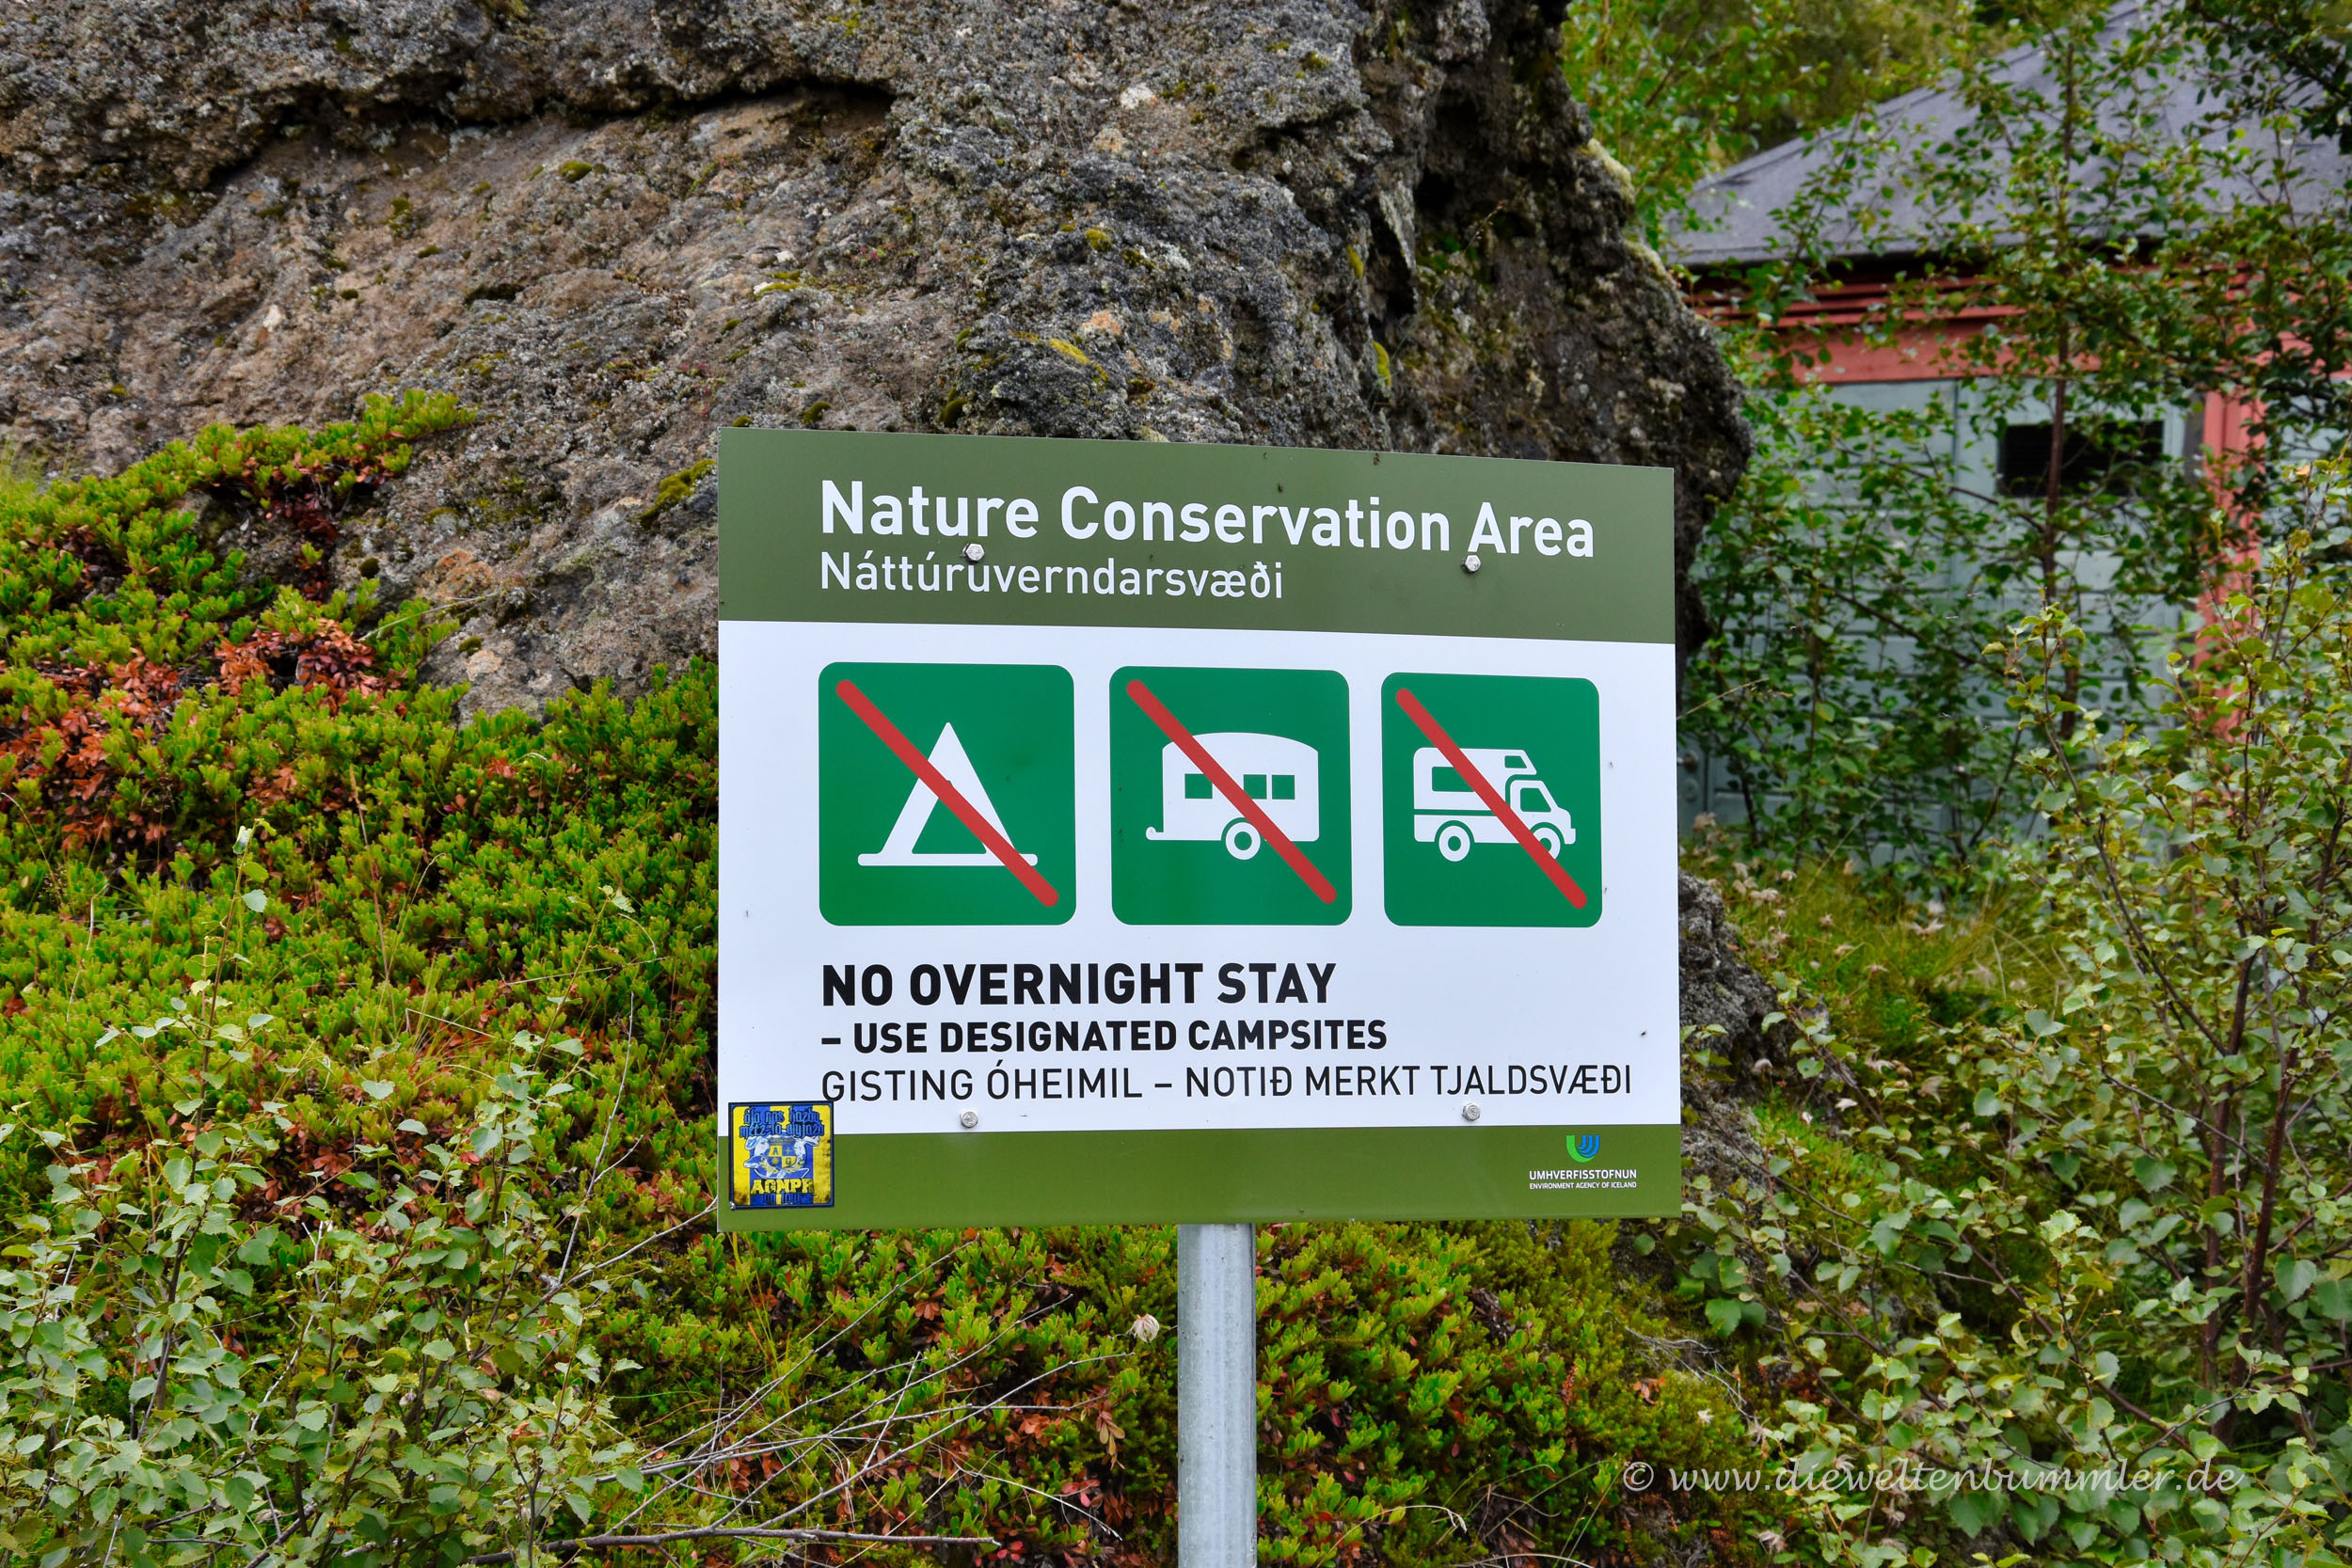 Wild campen verboten